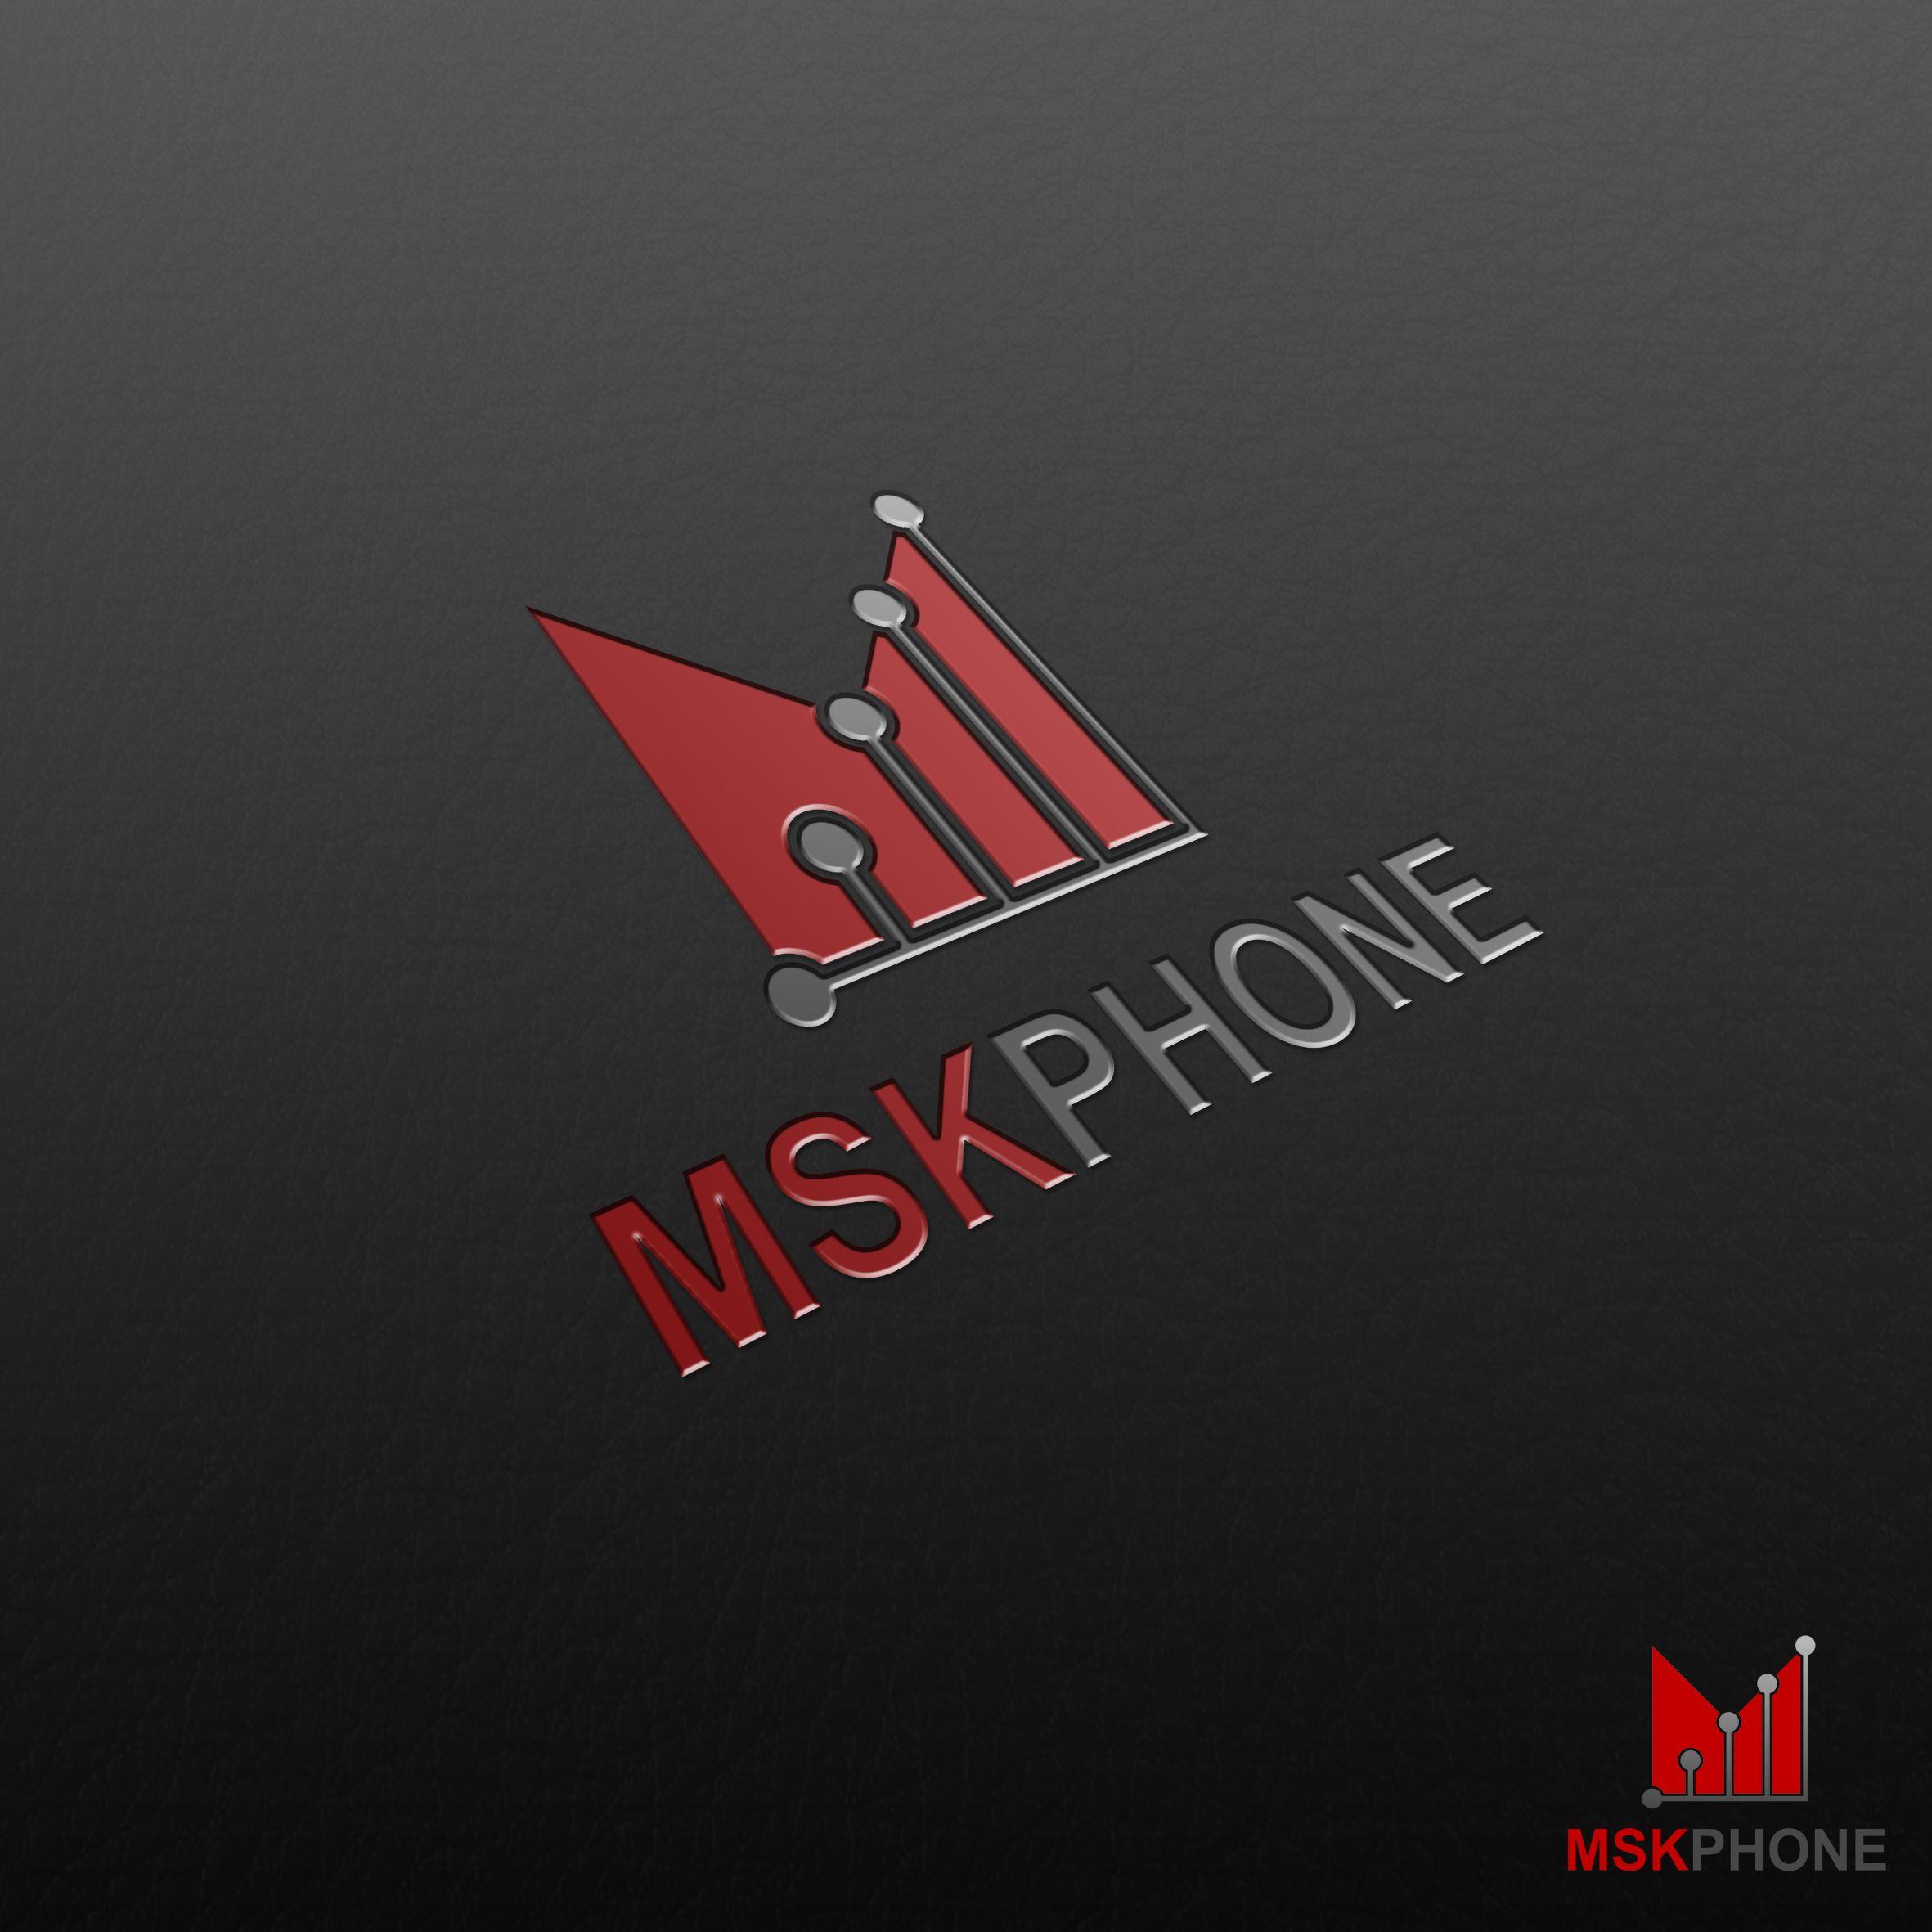 Логотип для MSKPHONE - дизайнер stason2008